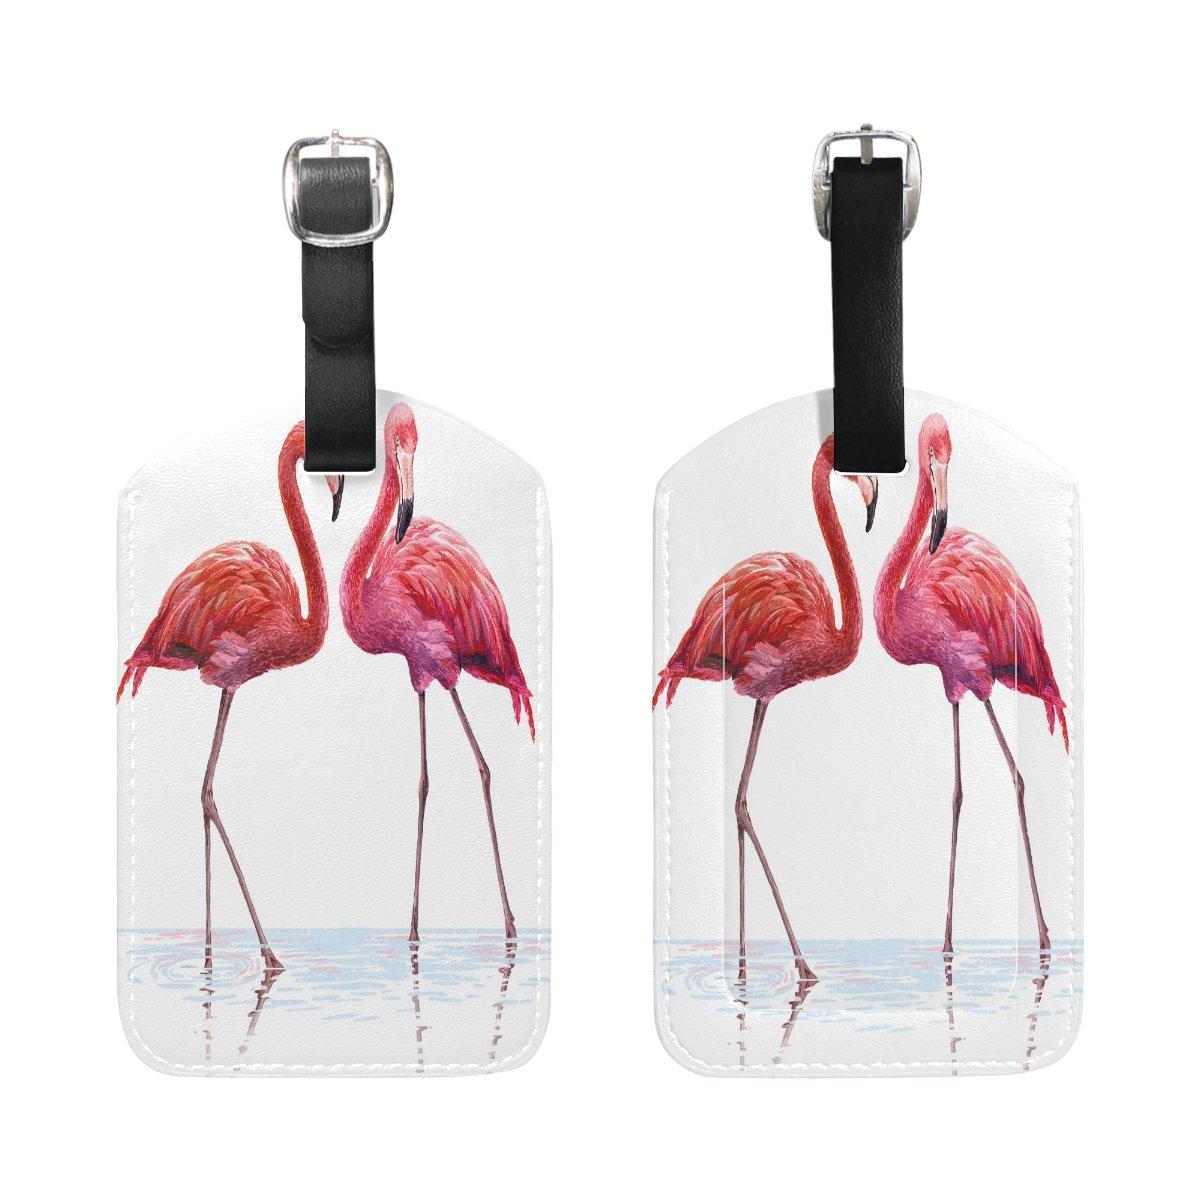 Saobao Travel Luggage Tag Colorful Pink Flamingo PU Leather Baggage Suitcase Travel ID Bag Tag 1Pcs